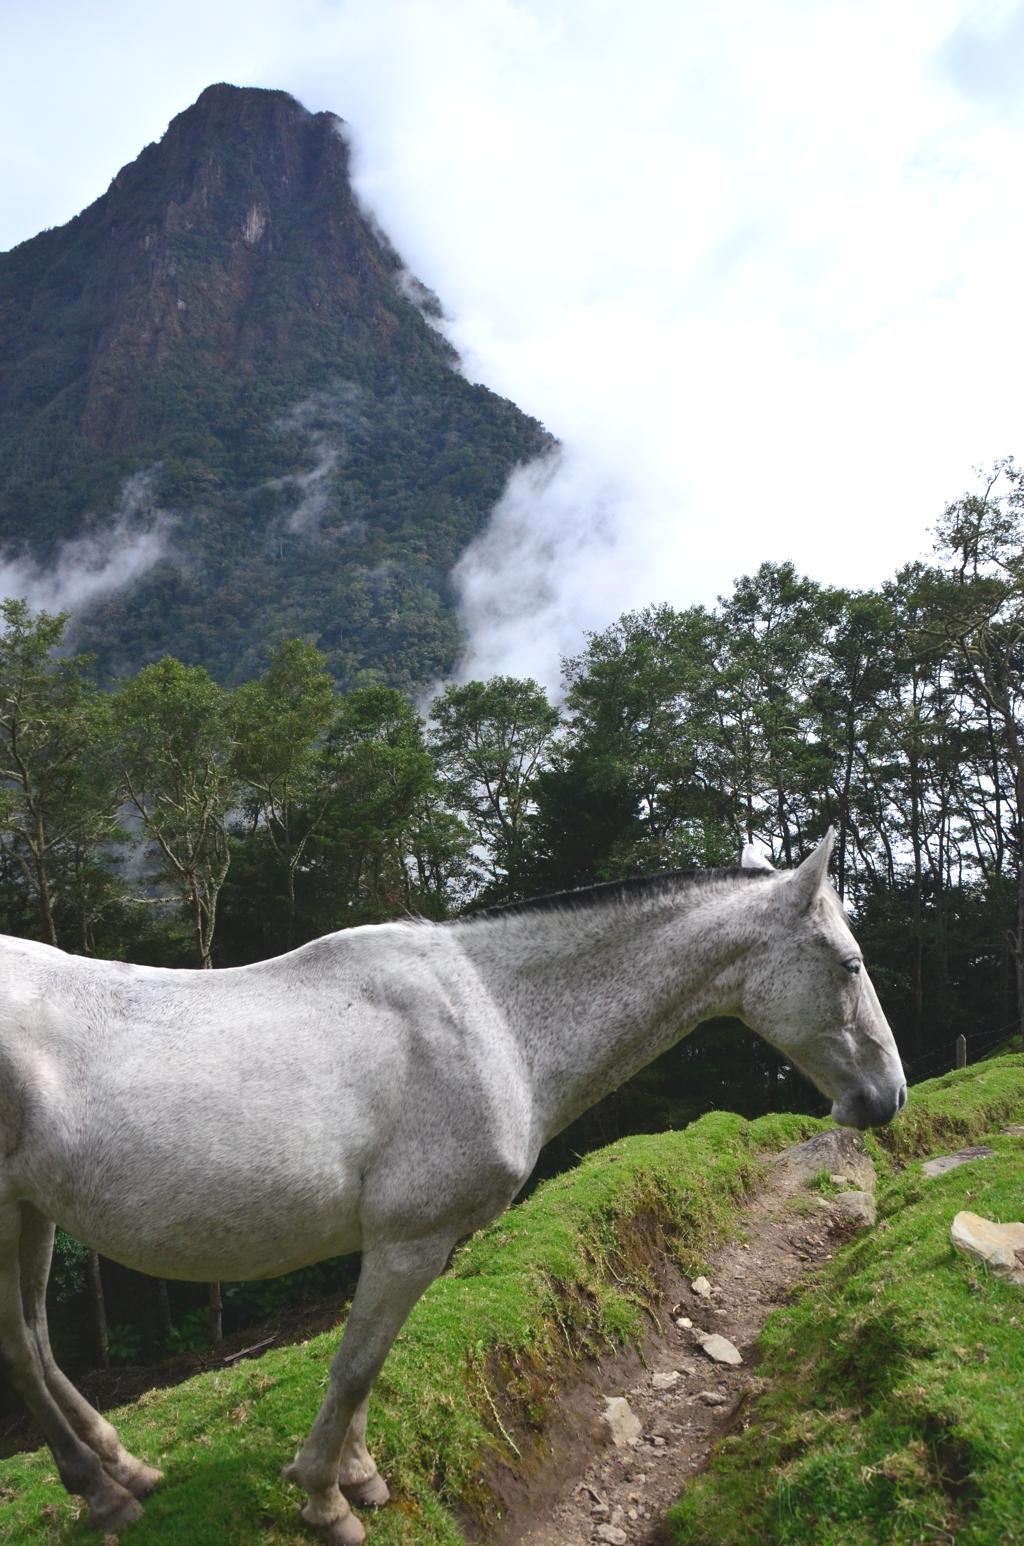 Colombian wild horses